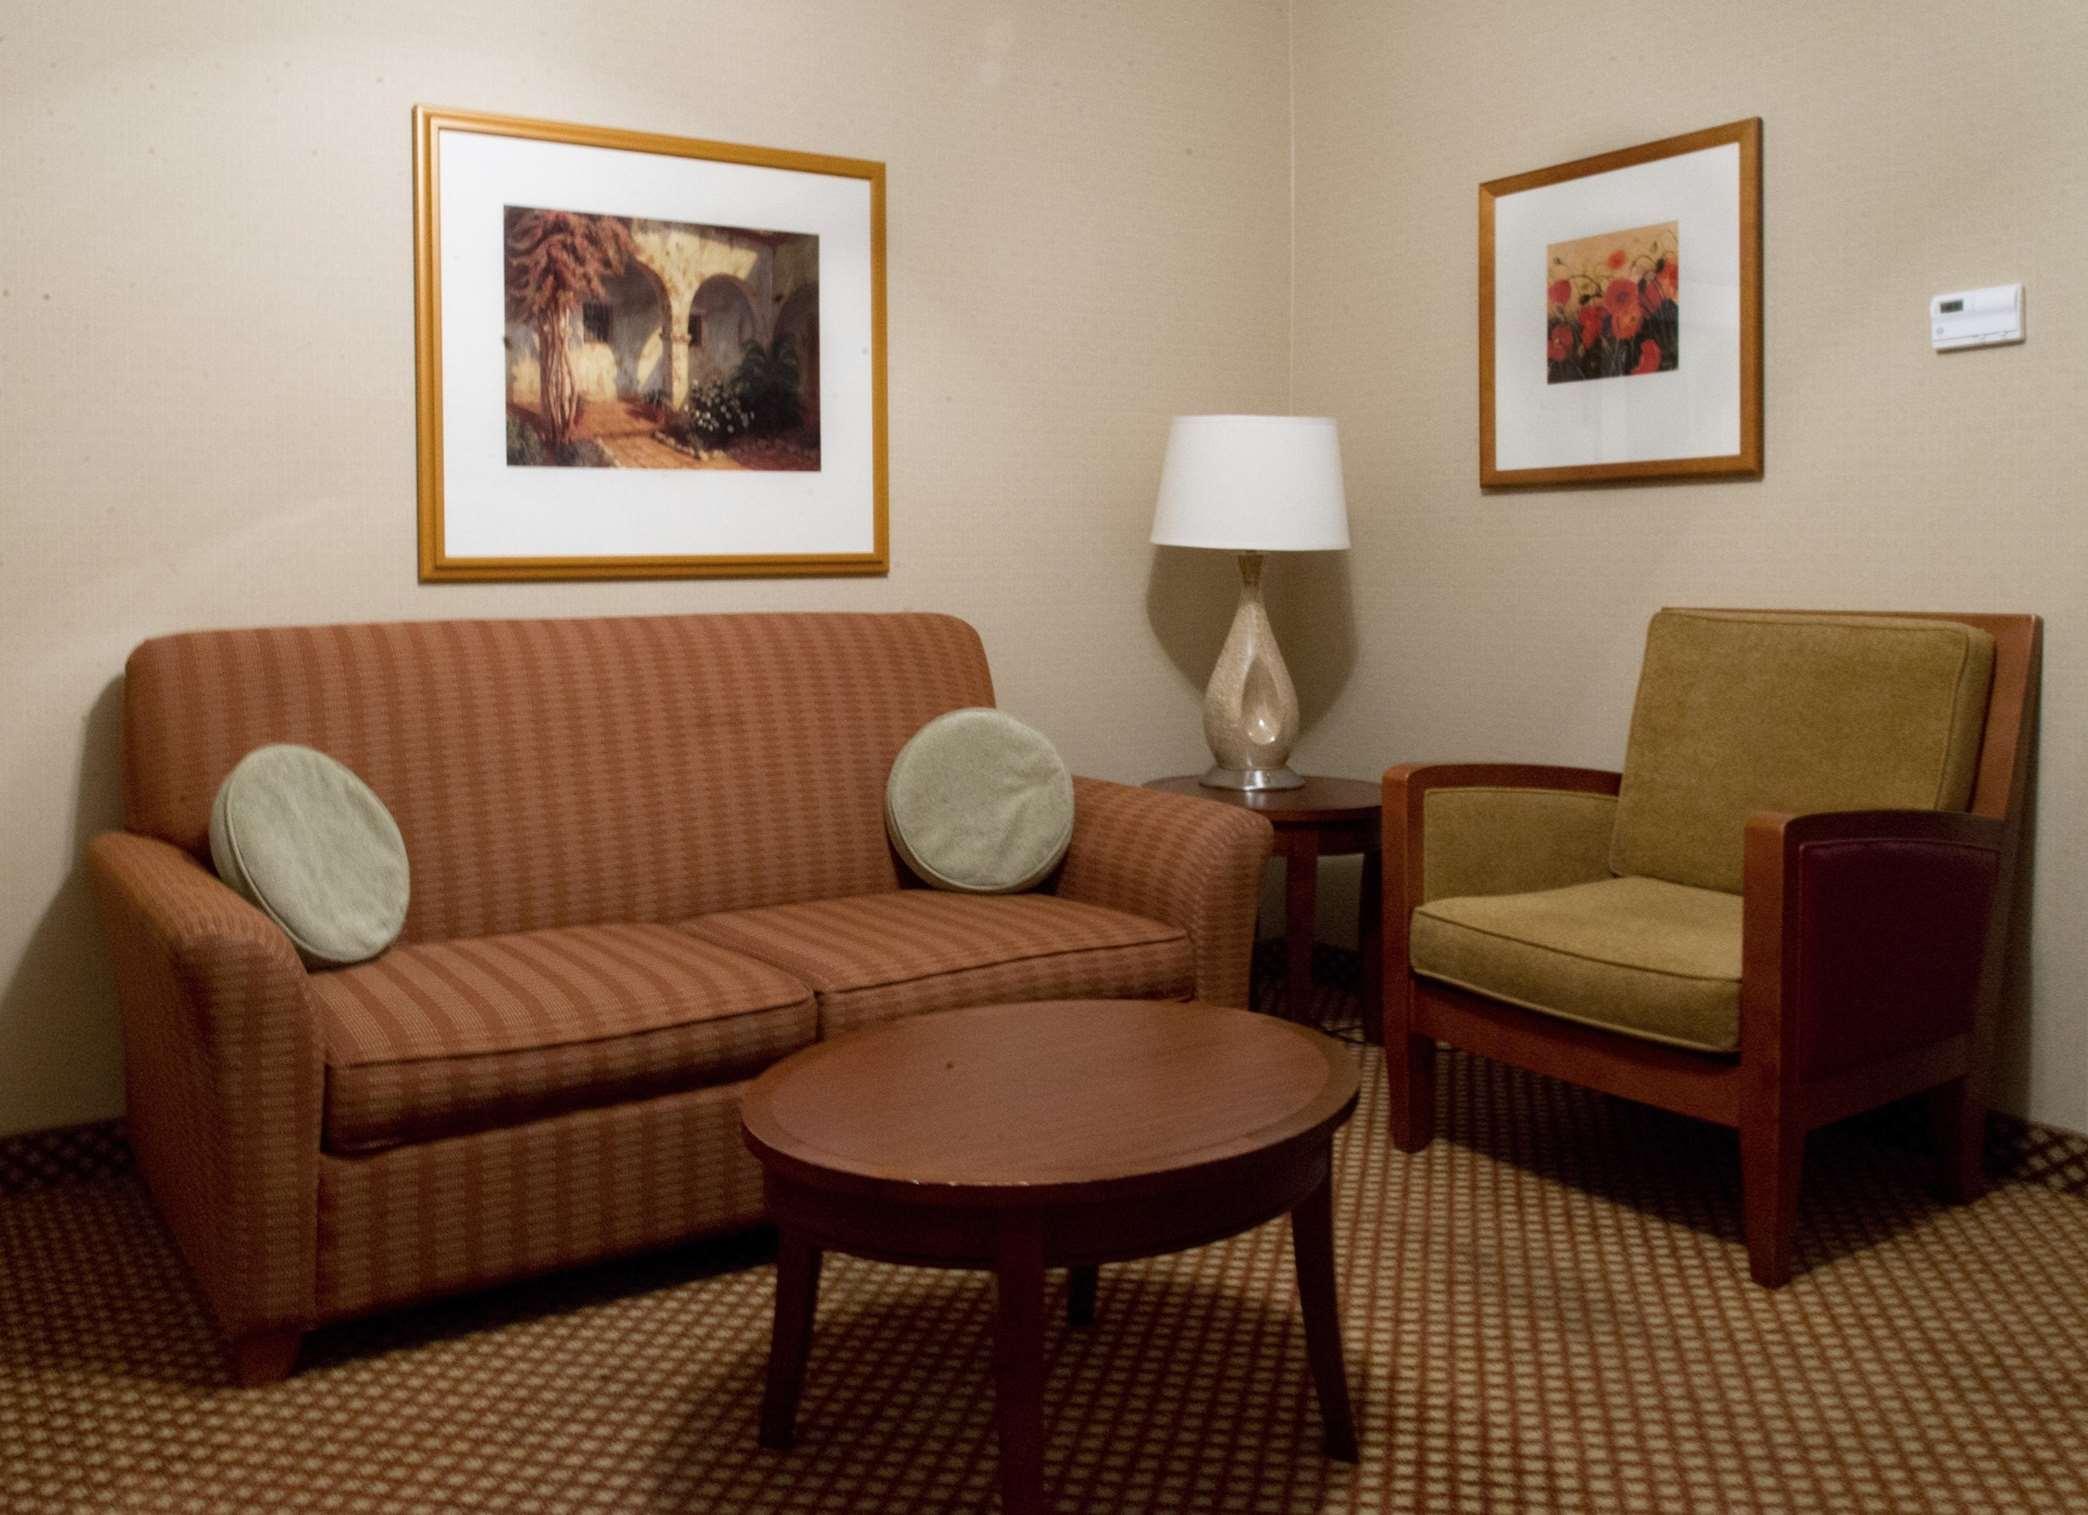 hilton garden inn laramie 2229 grand ave laramie wy hotels motels mapquest - Hilton Garden Inn Laramie